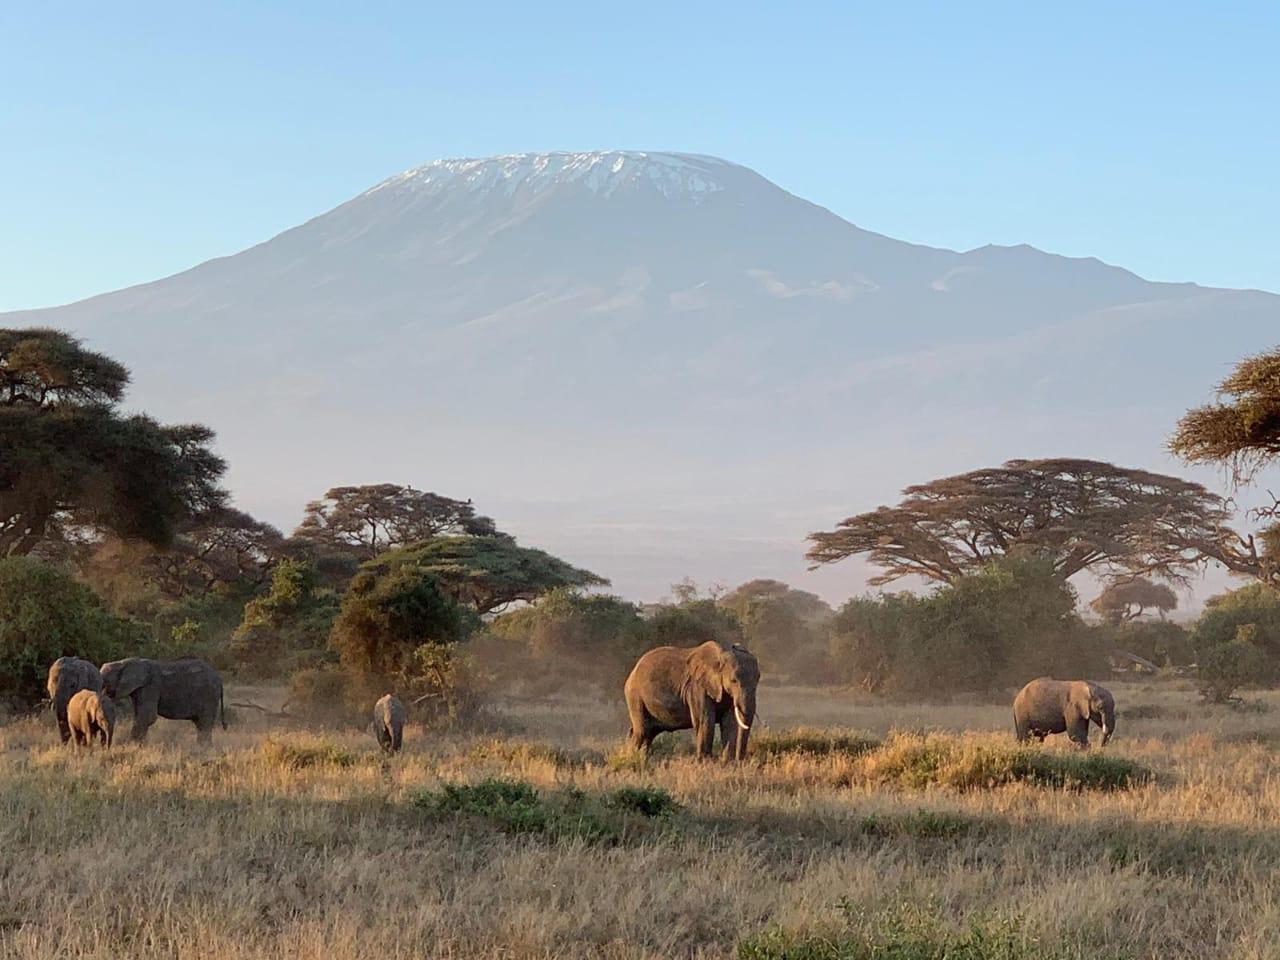 Elephants at Amboseli